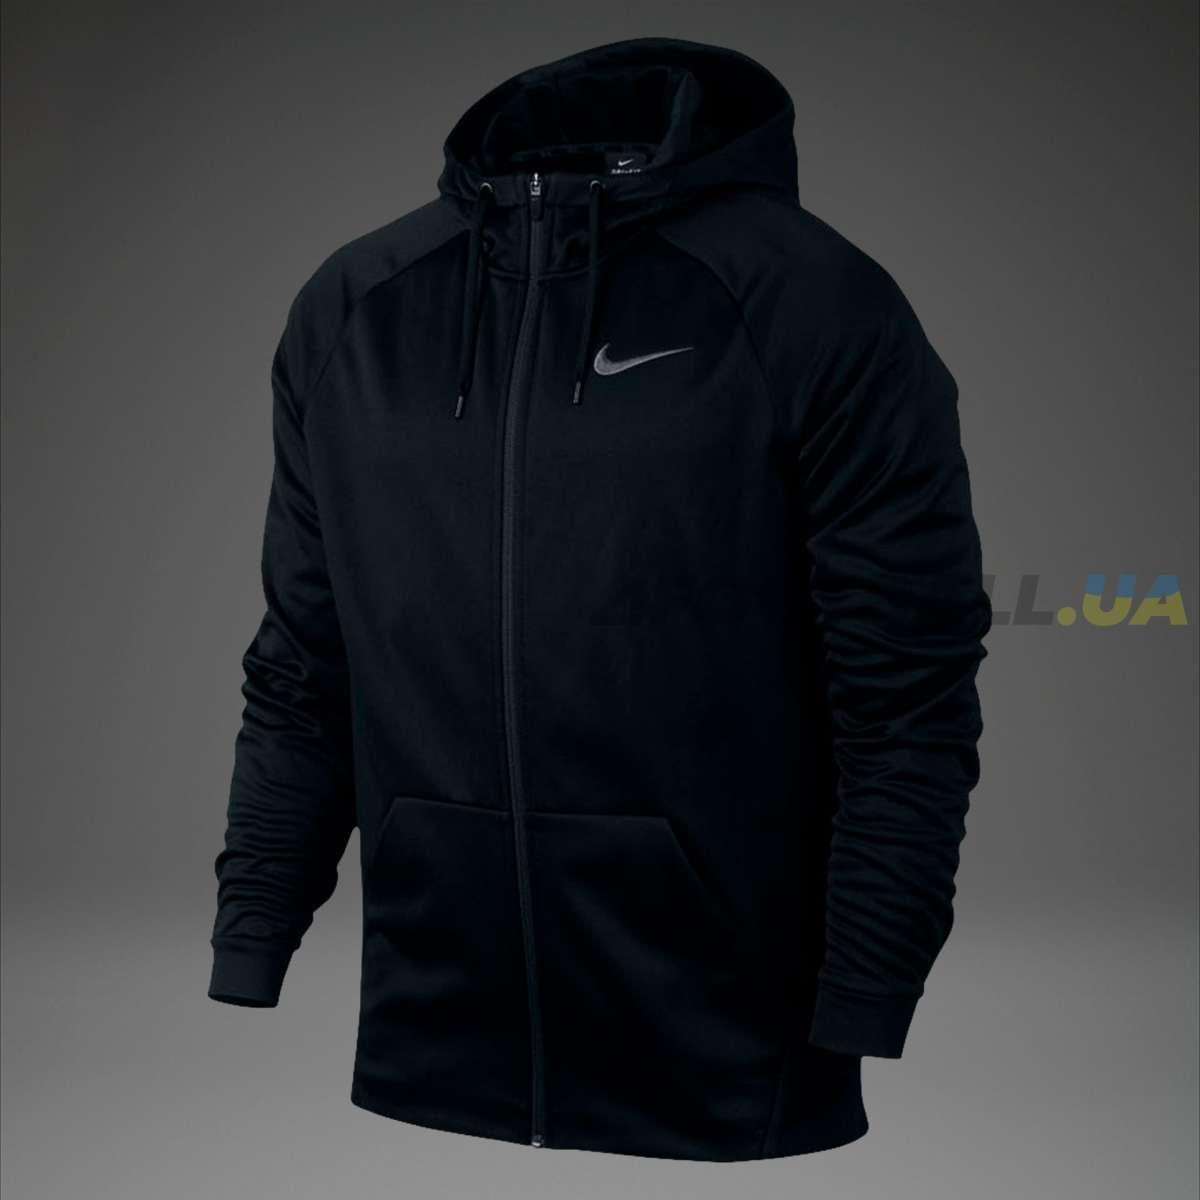 9f6ad9bc Плотное теплое худи на молнии Nike Therma Training Full-Zip Hoodie  800187-010 ...